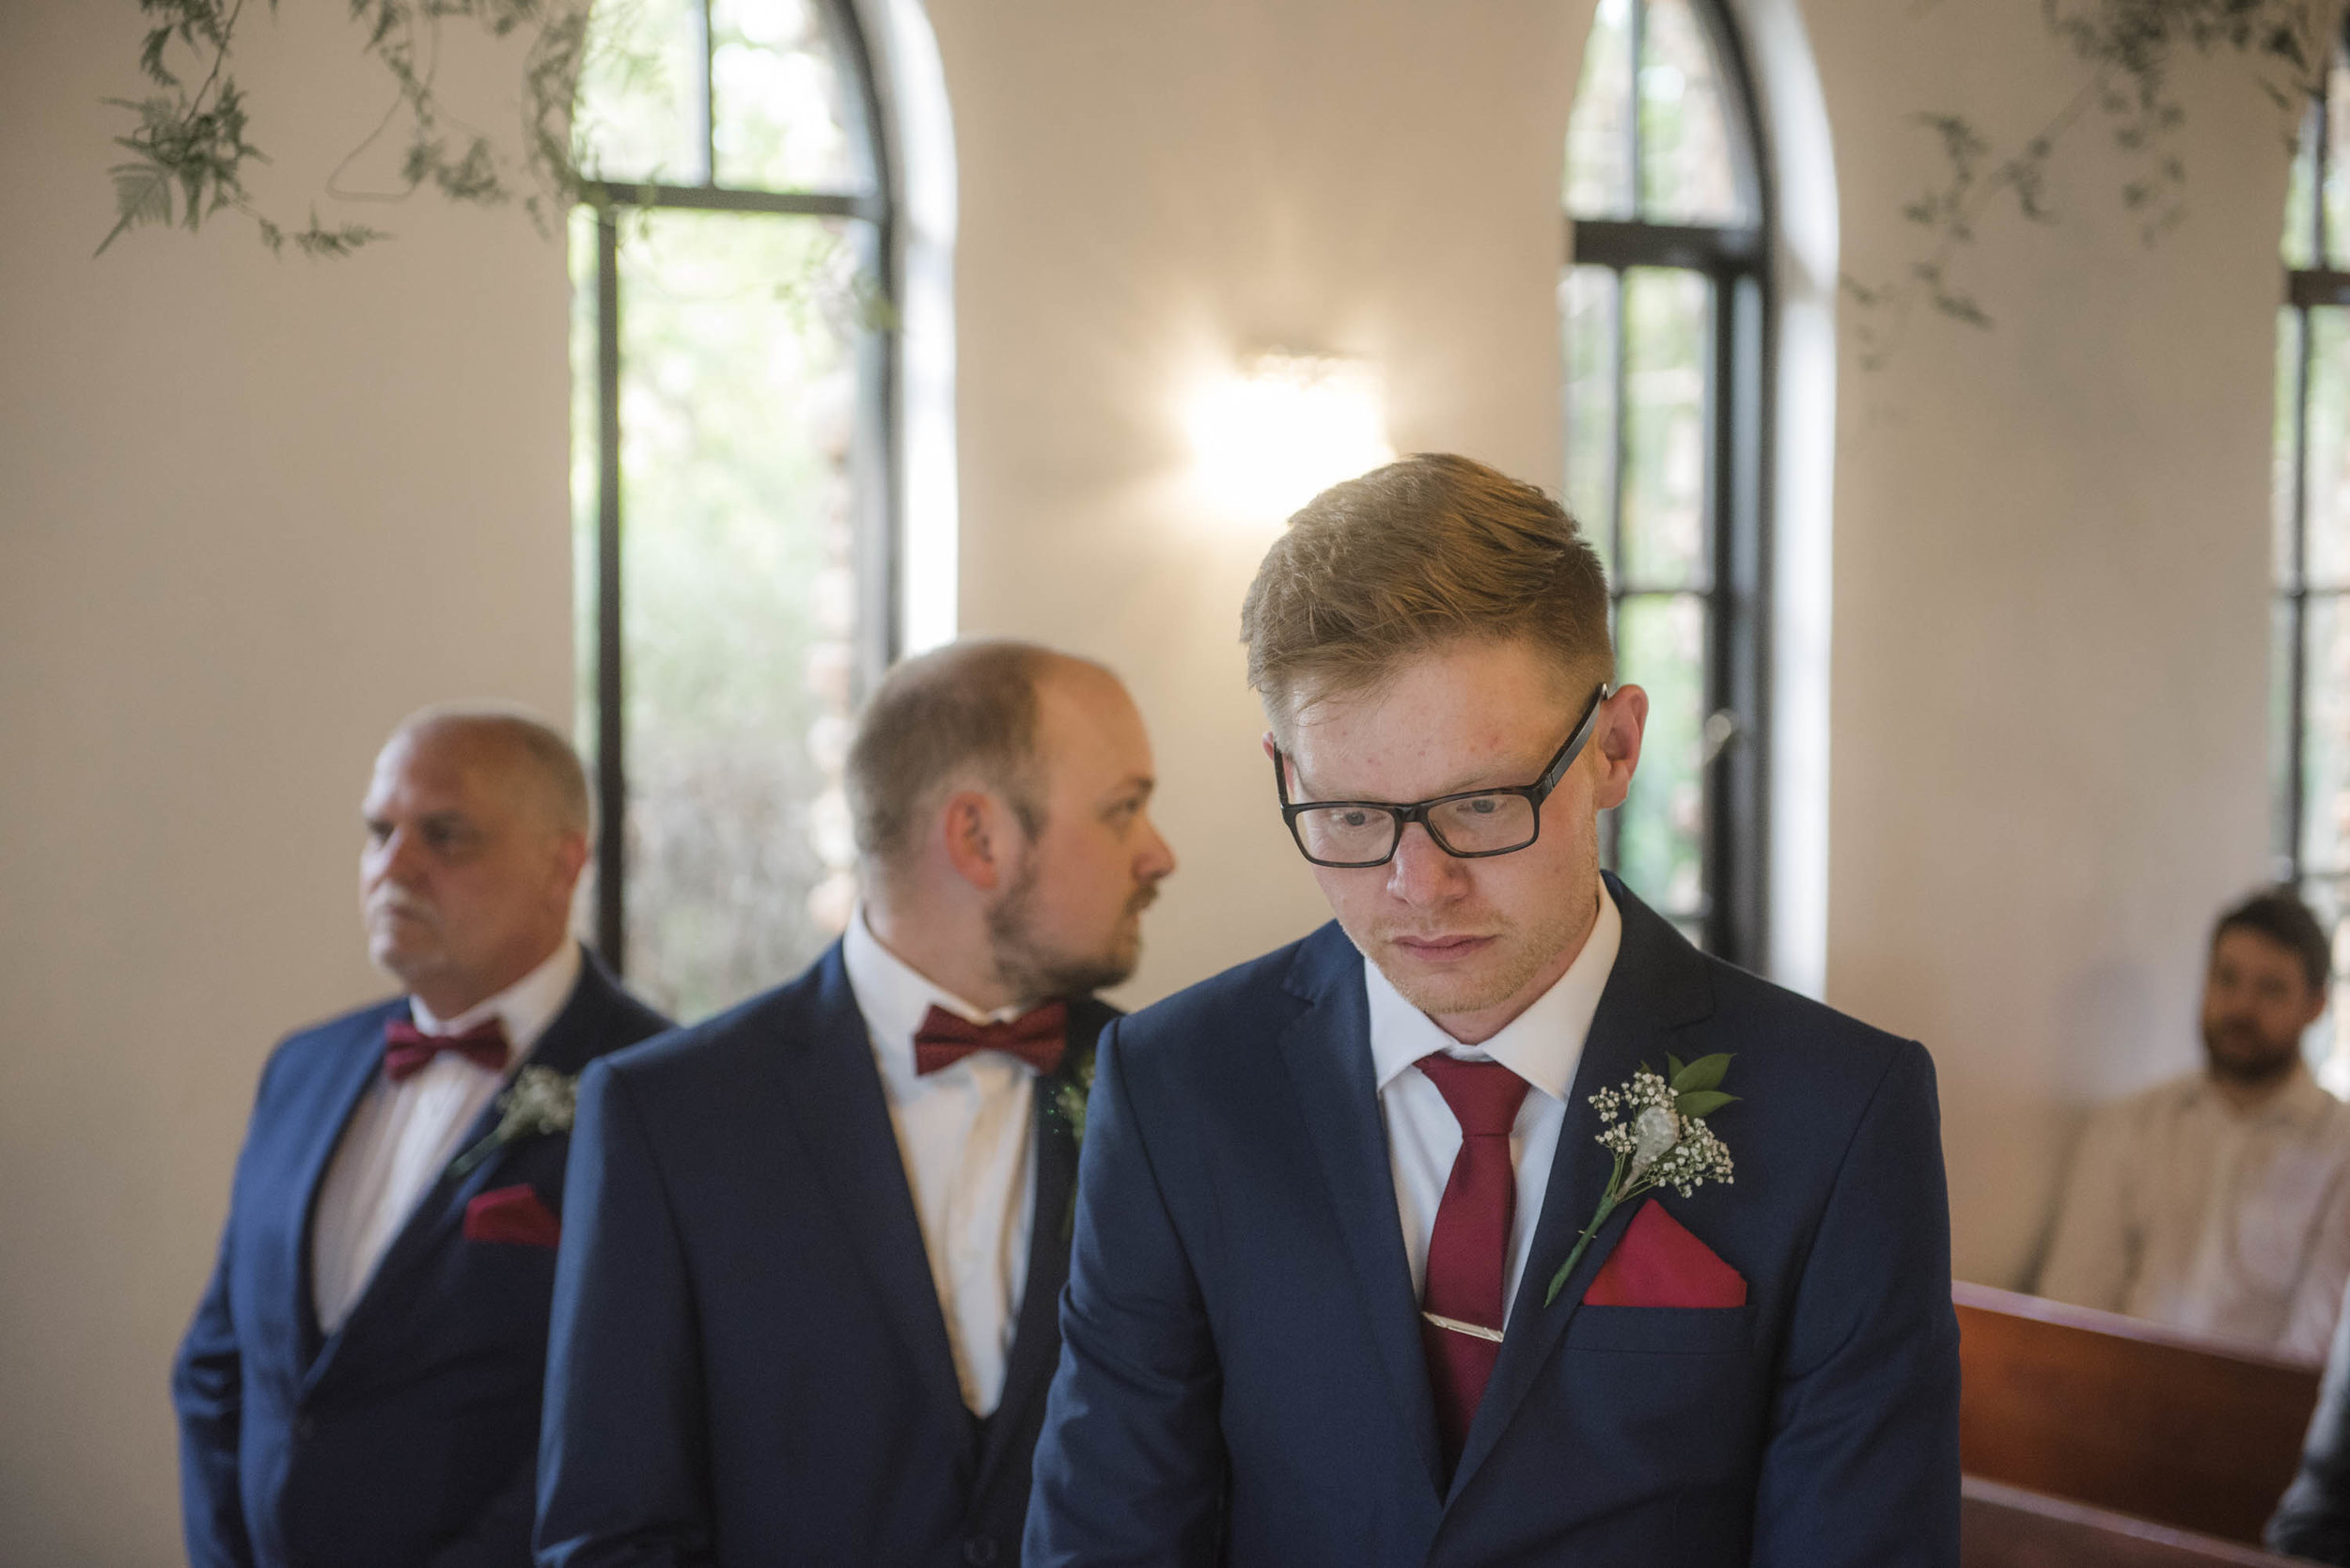 064-toadbury-hall-wedding-photos.JPG